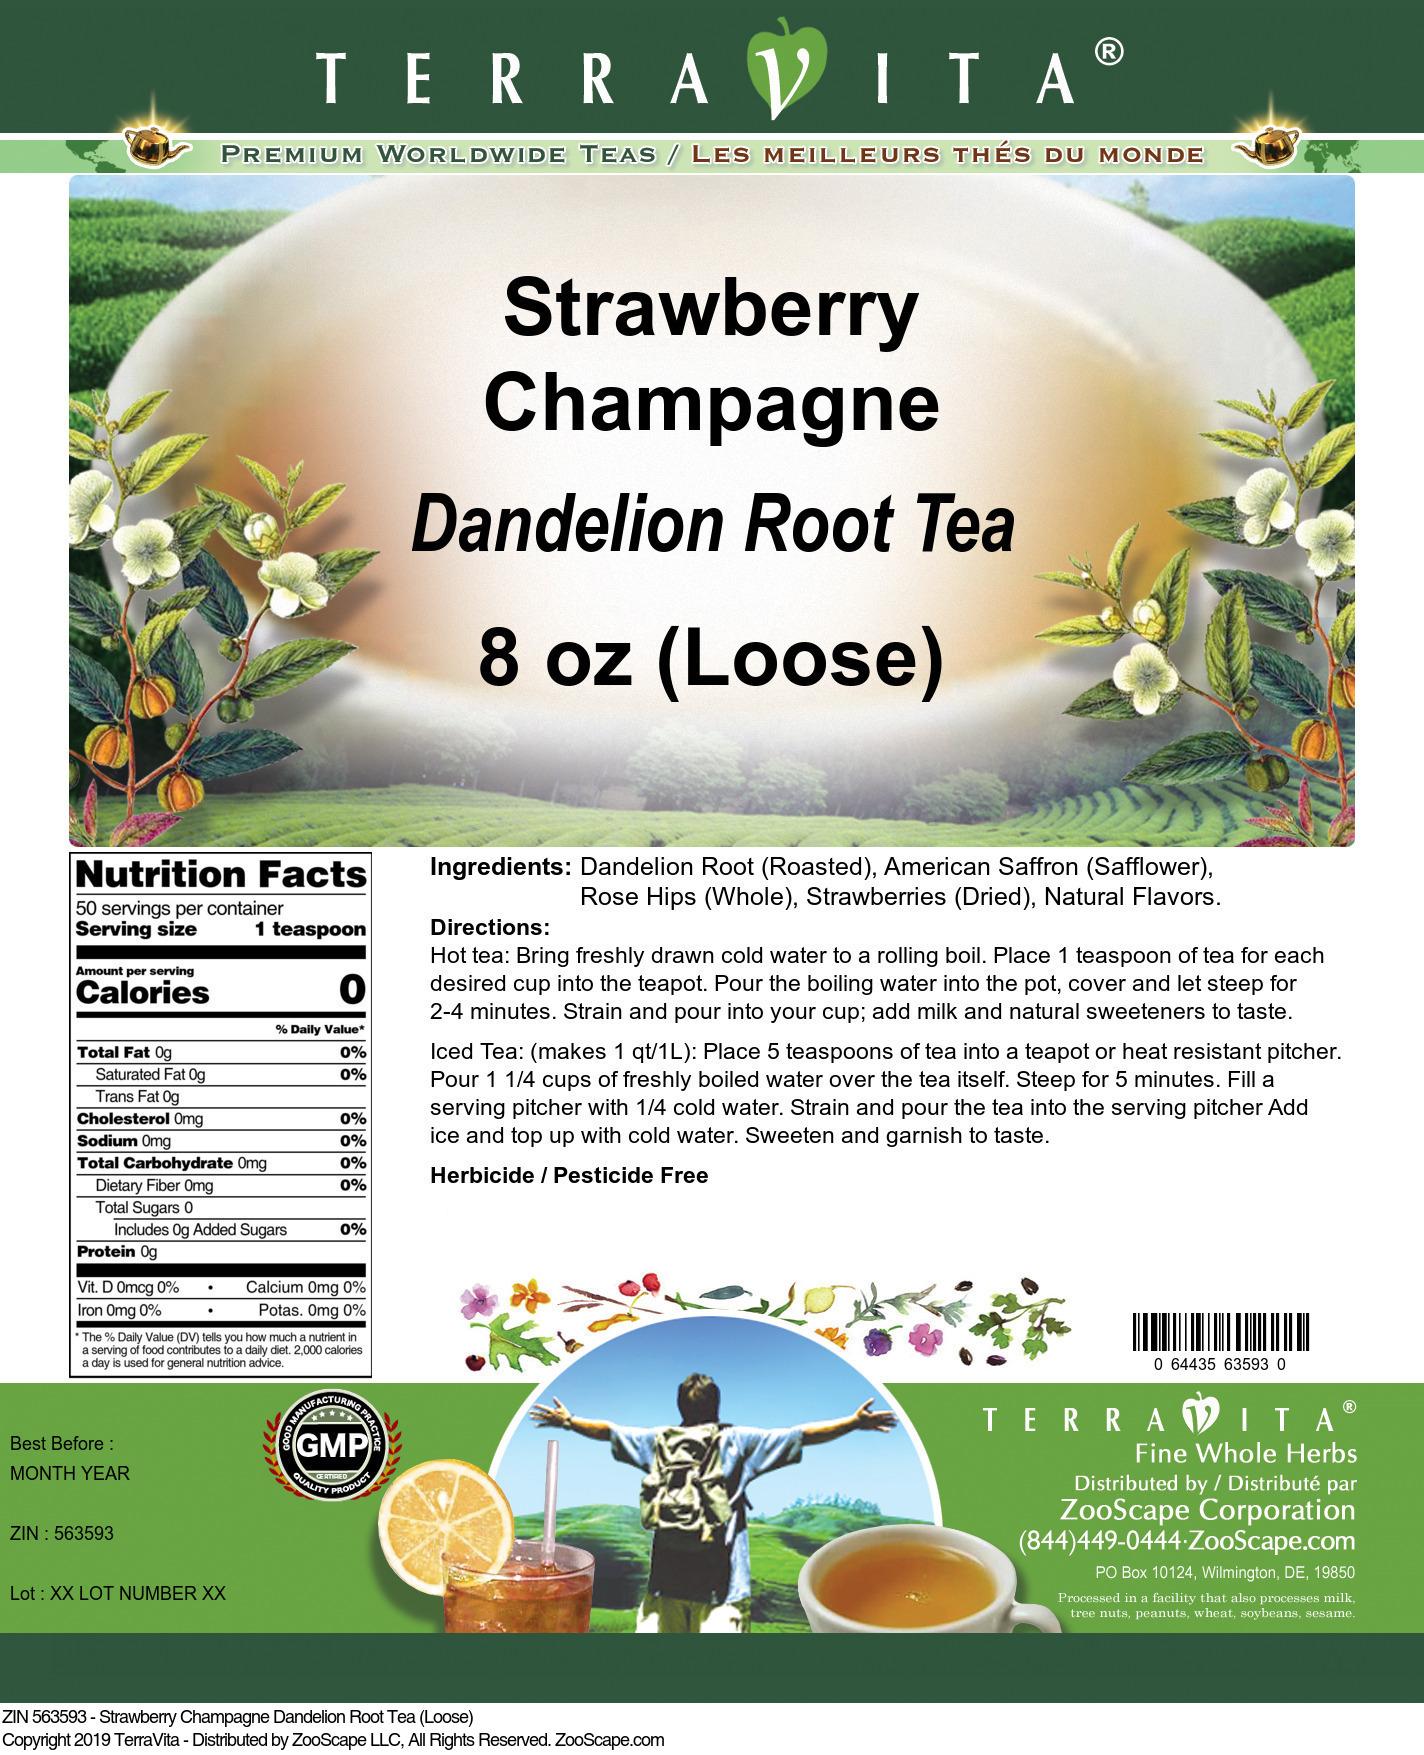 Strawberry Champagne Dandelion Root Tea (Loose)